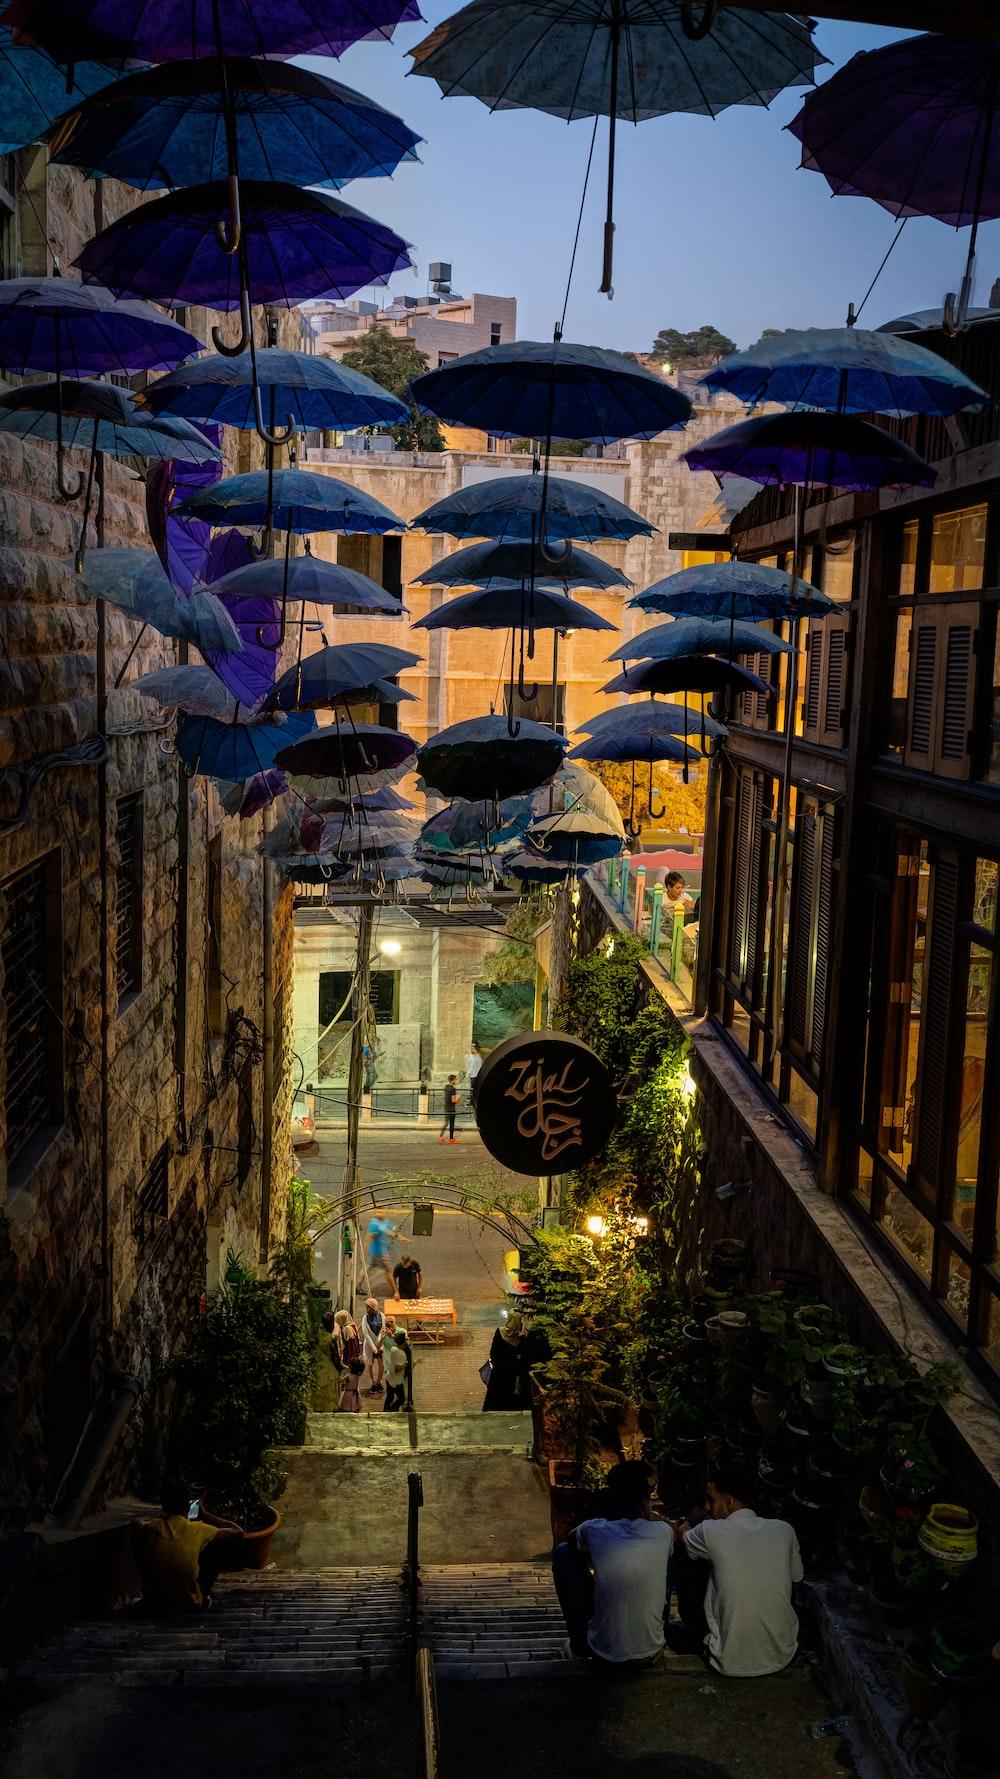 blue umbrella near brown brick building